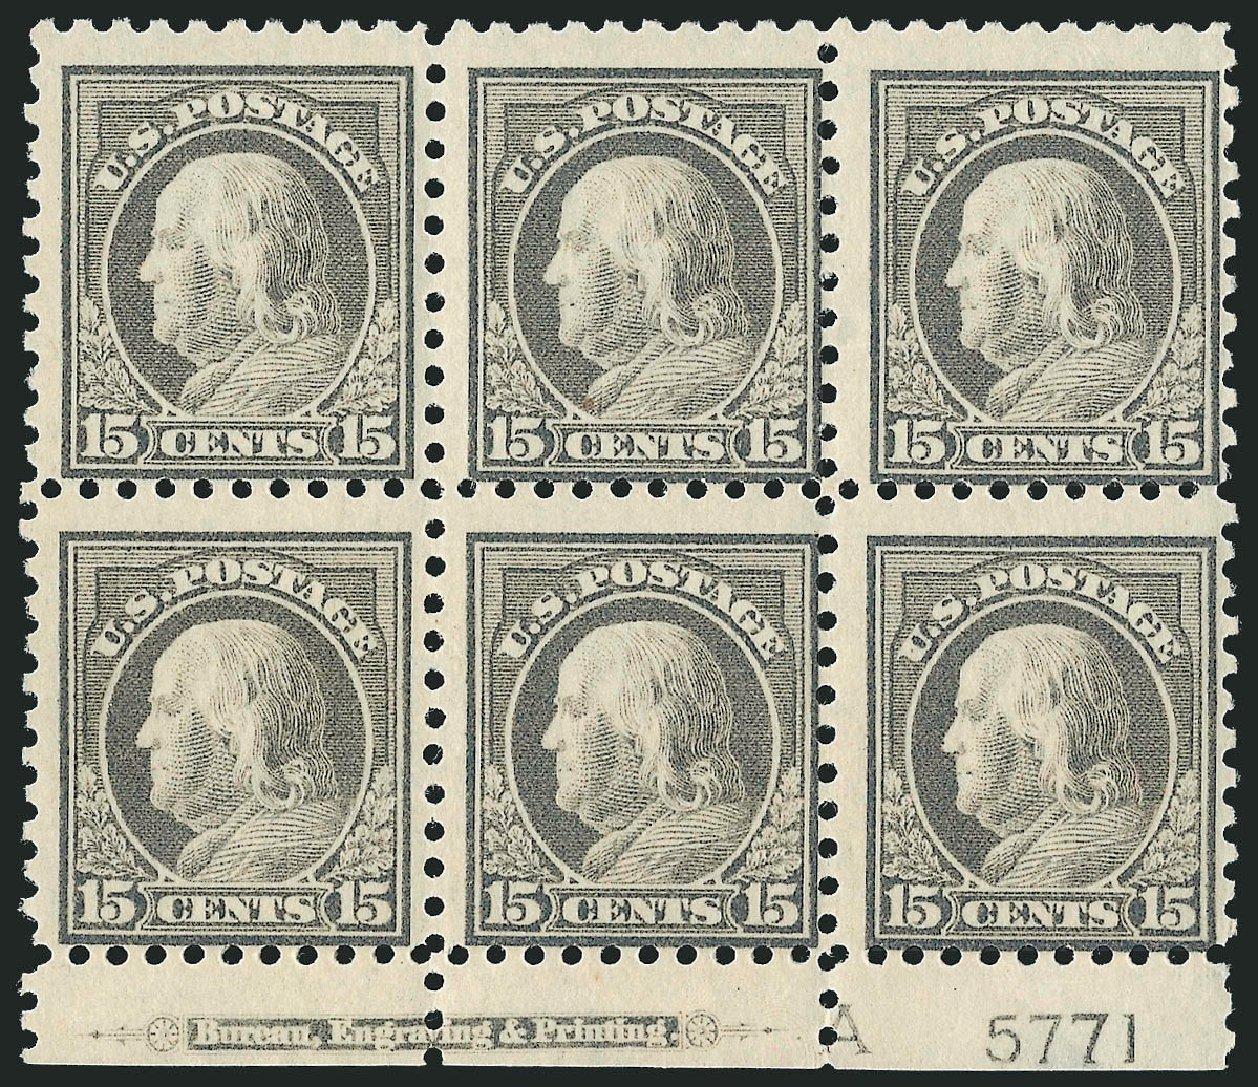 Prices of US Stamps Scott Catalogue # 437 - 15c 1914 Franklin Perf 10. Robert Siegel Auction Galleries, Jul 2014, Sale 1077, Lot 268